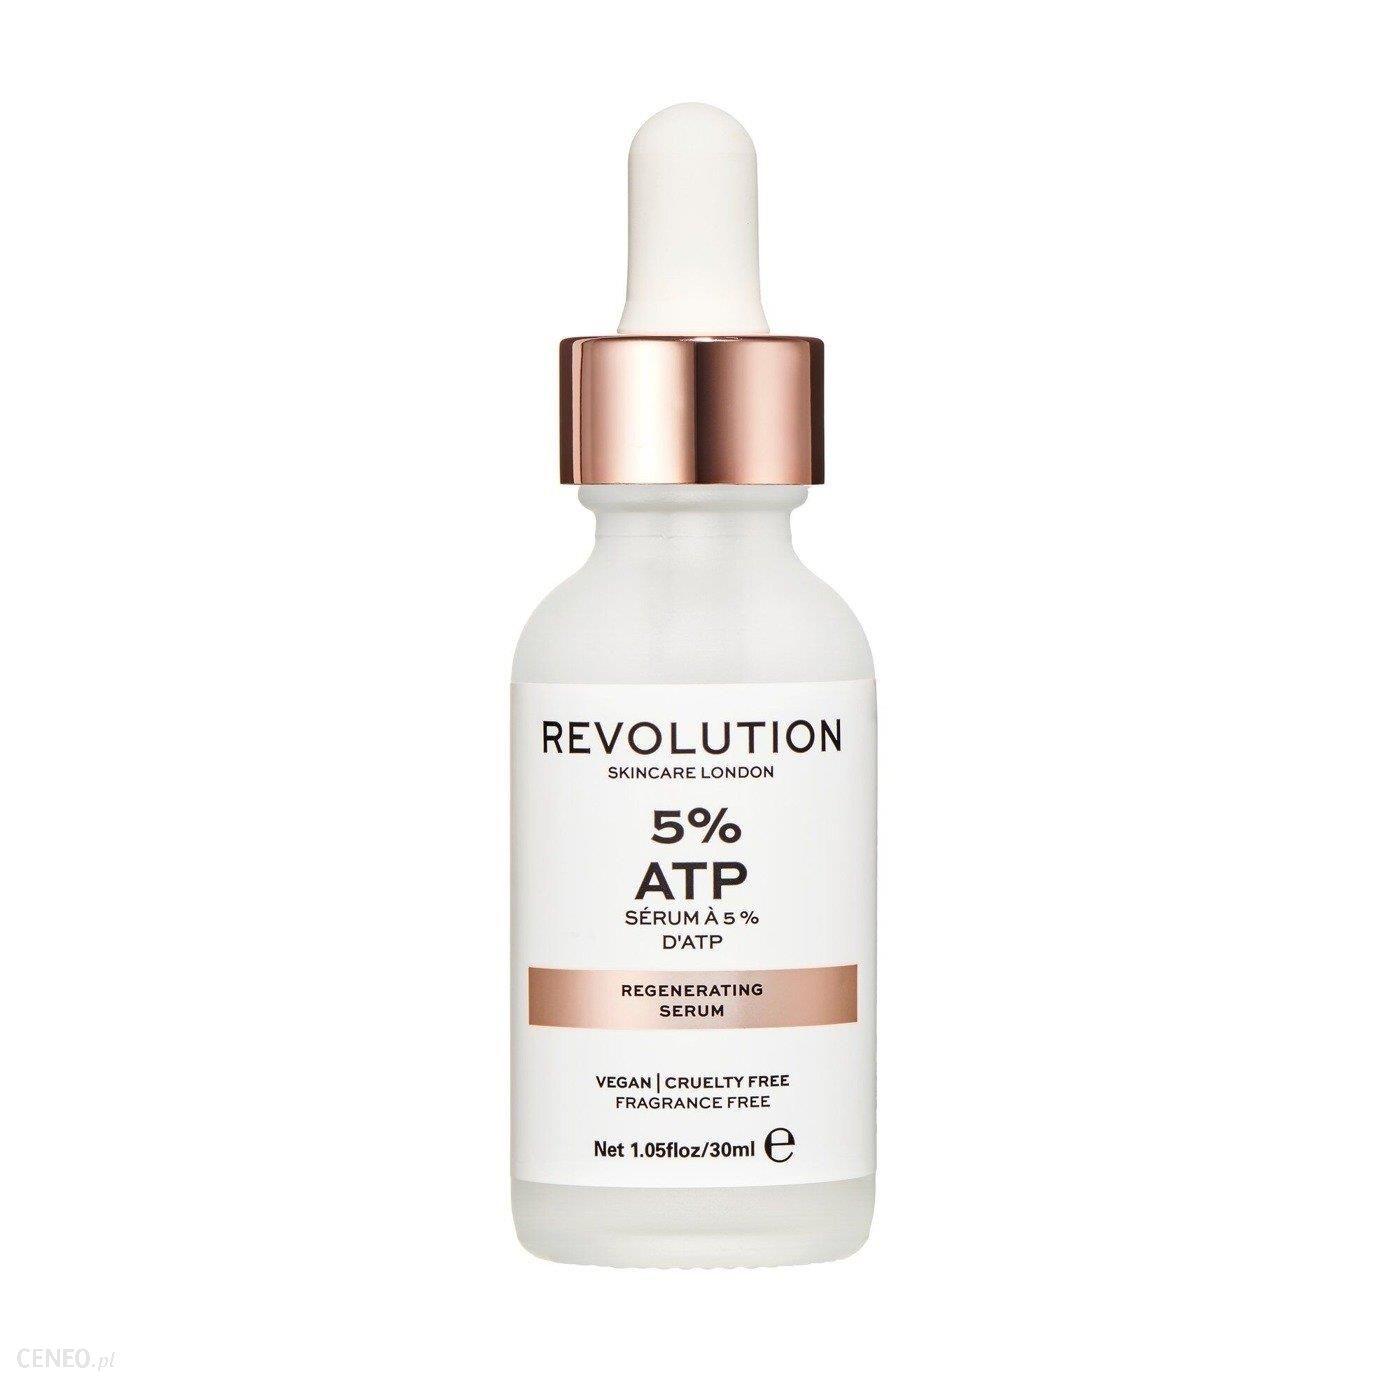 Revolution Skincare Skin Hydration&Regenerating Serum 5% ATP Serum do skóry suchej zmęczonej i pozbawionej blasku 30ml